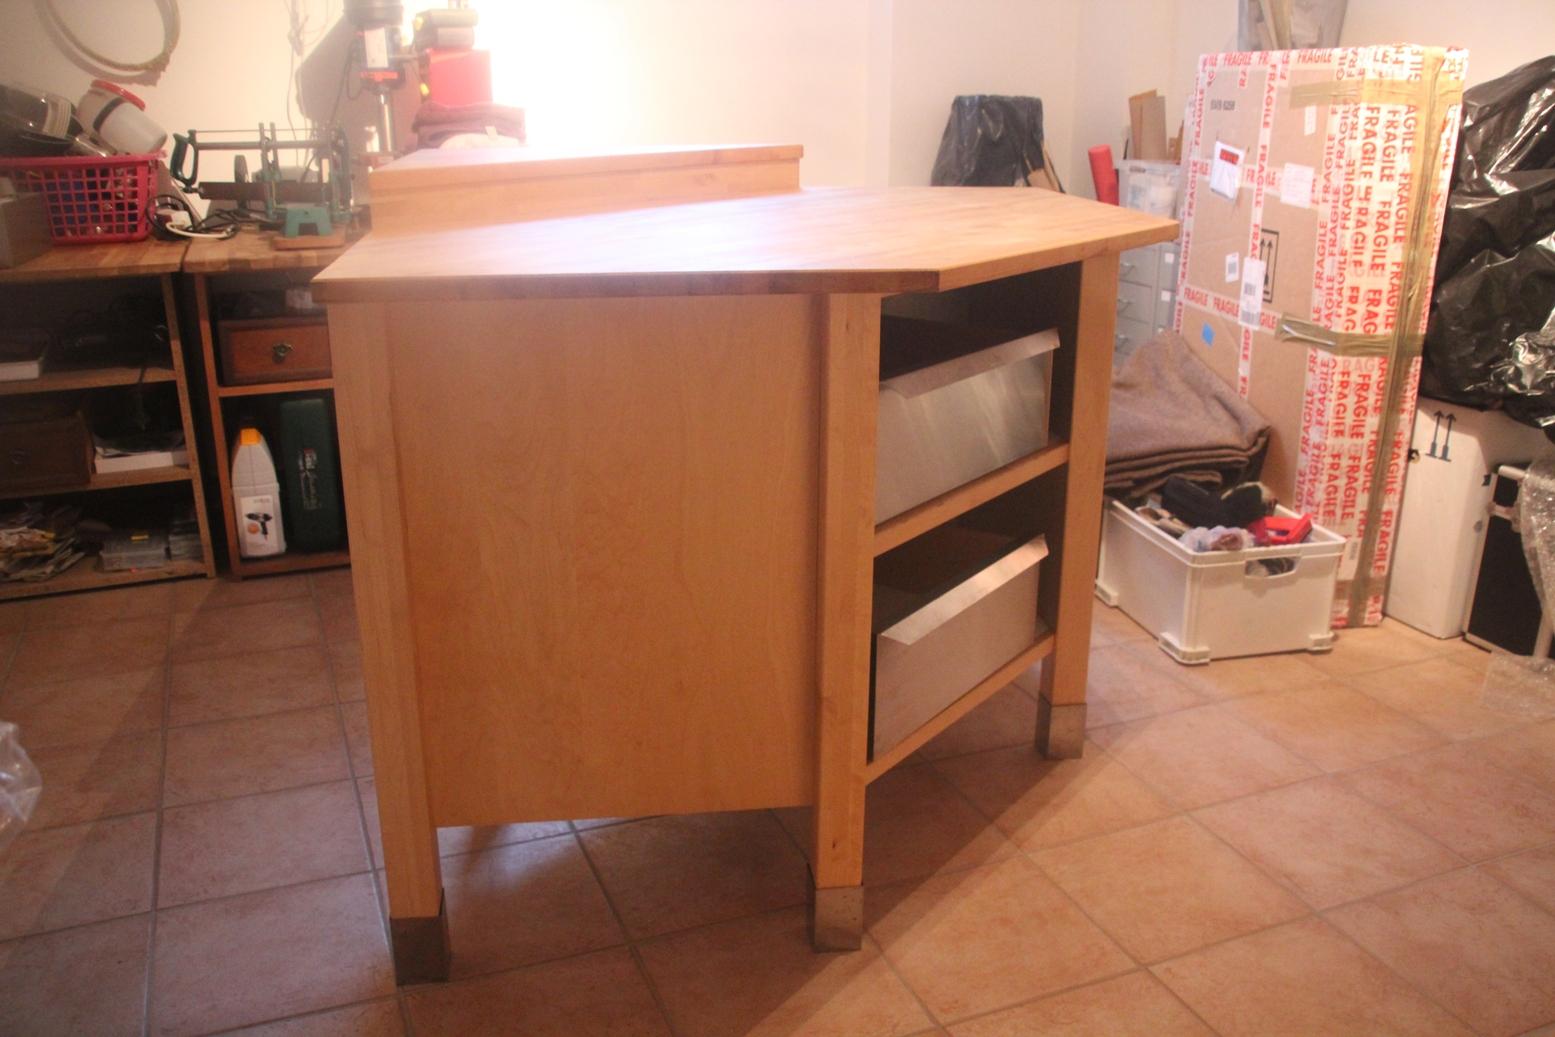 ikea v rde k chenschrank eckmodul eckschrank eckelement birke inkl 2 schubladen ebay. Black Bedroom Furniture Sets. Home Design Ideas